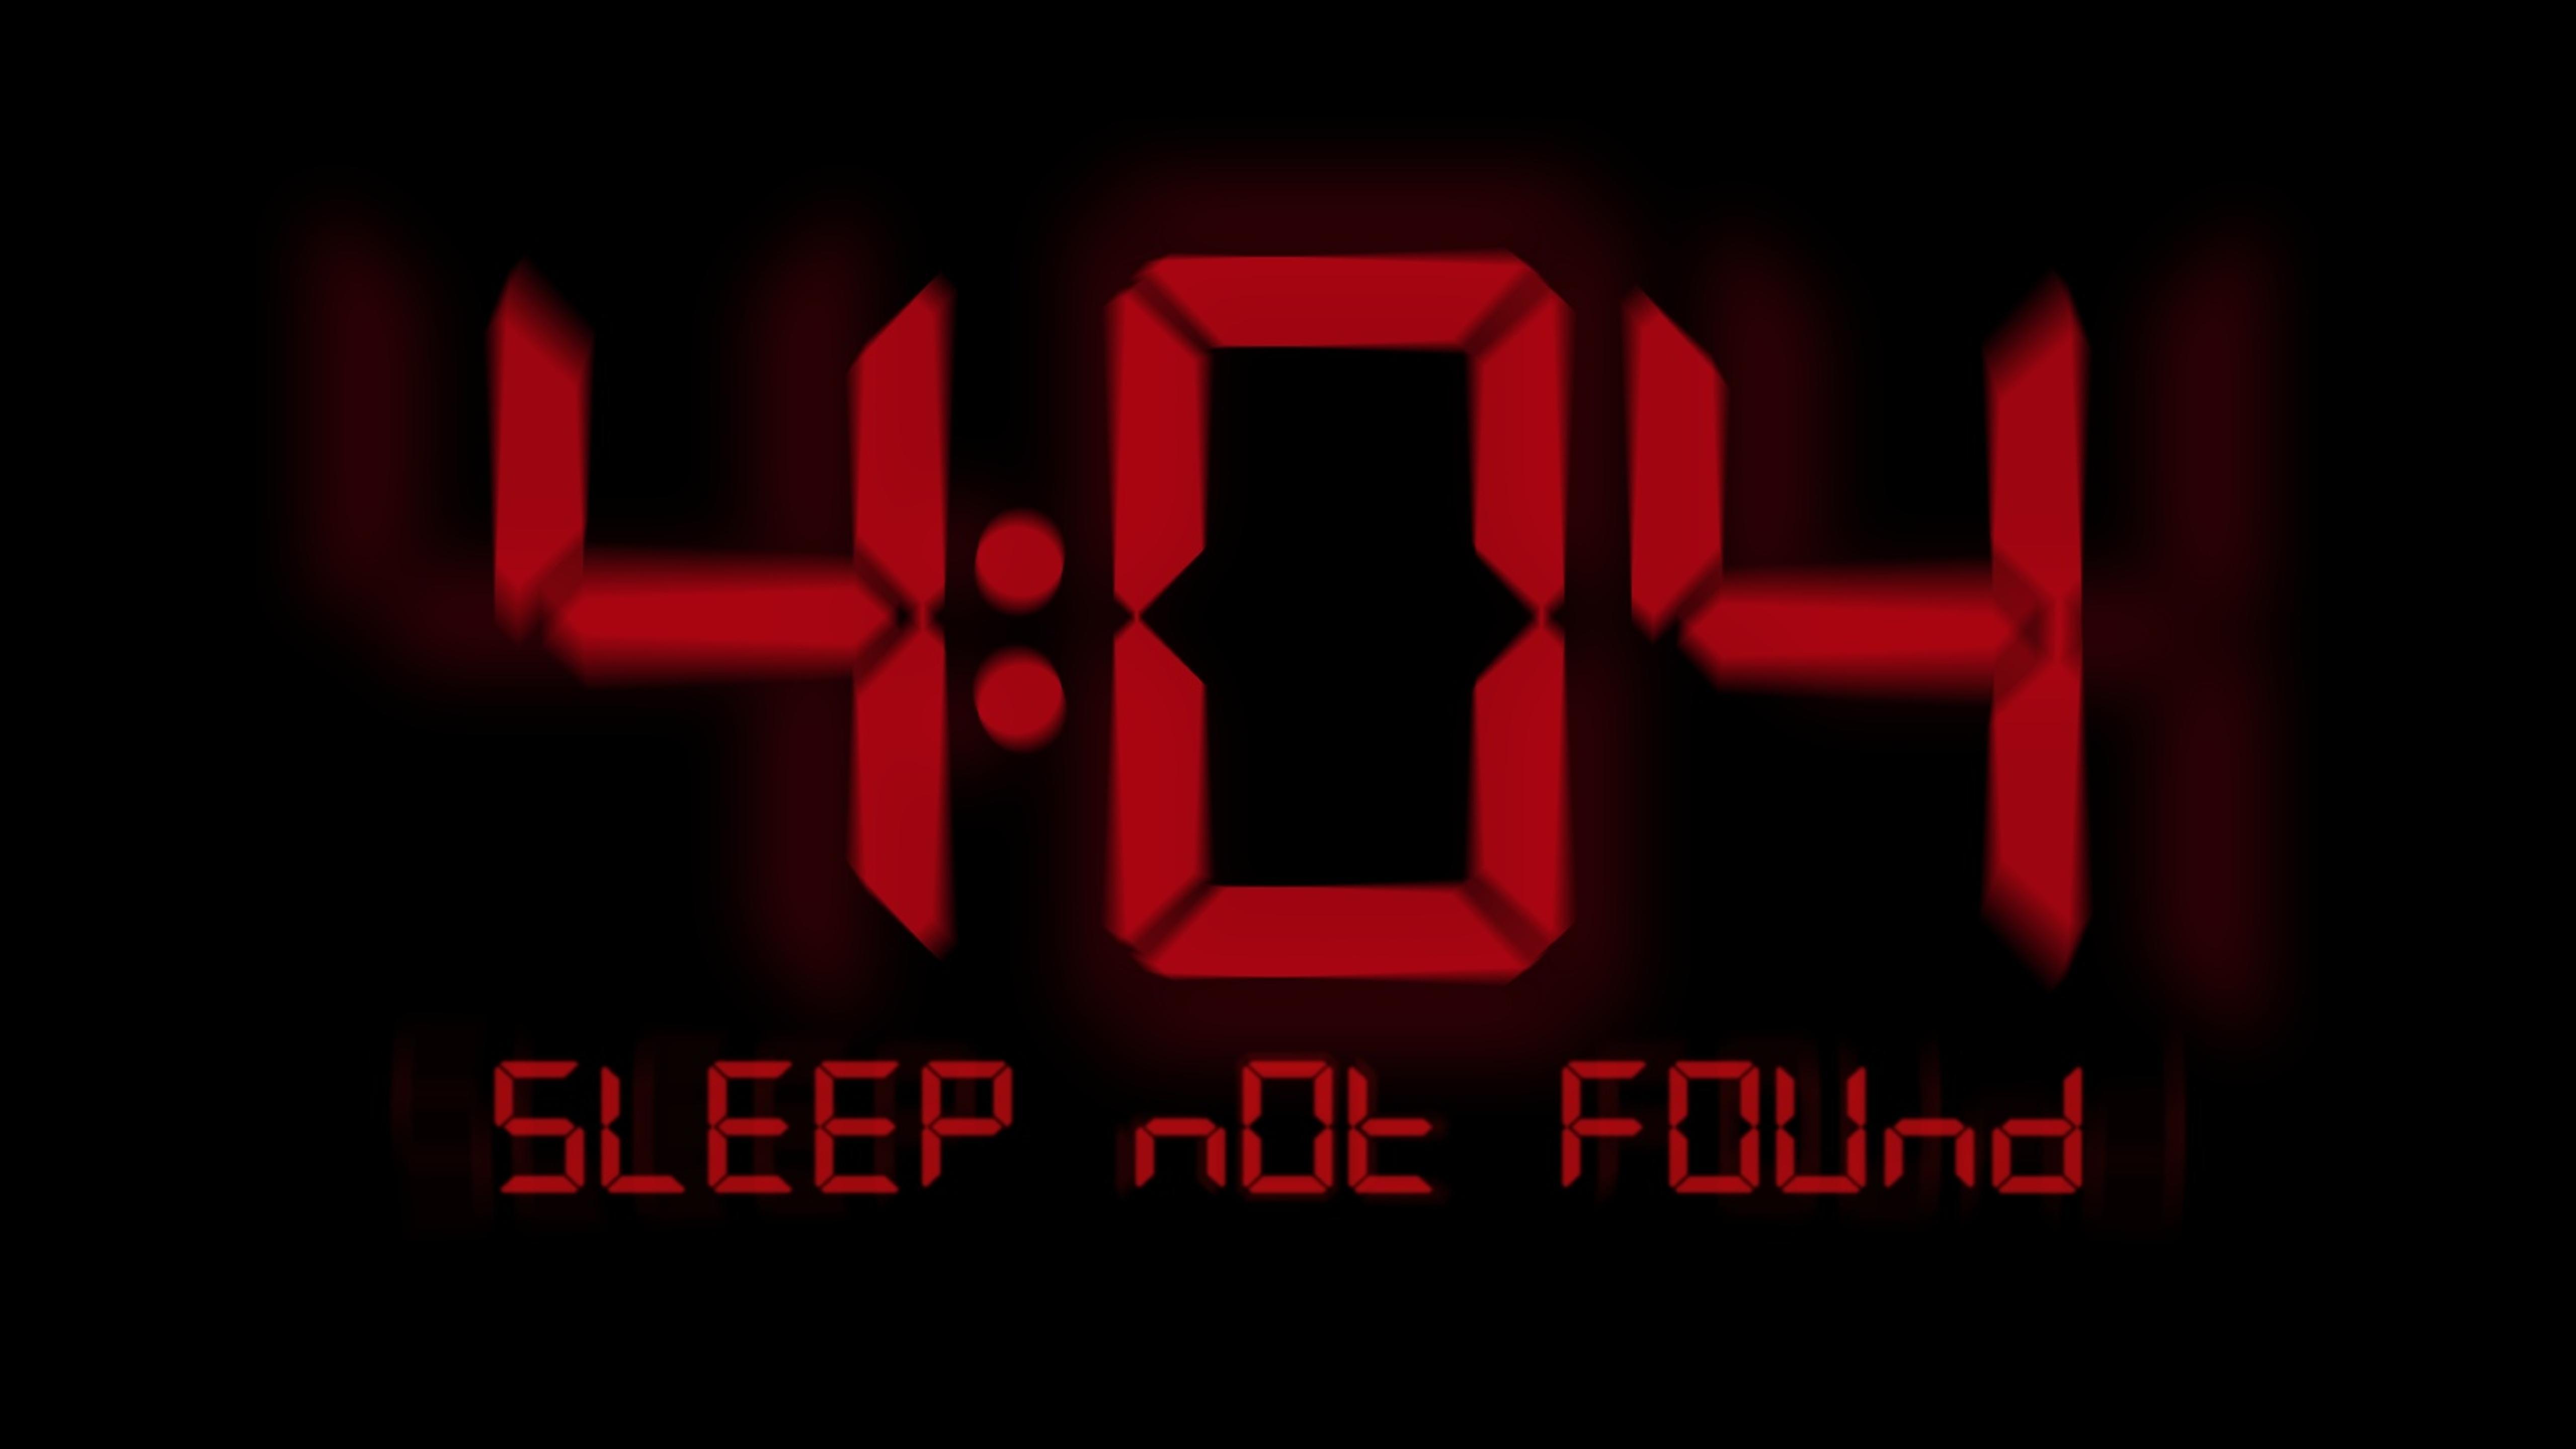 error sleep not found wallpaper download 5120x2880